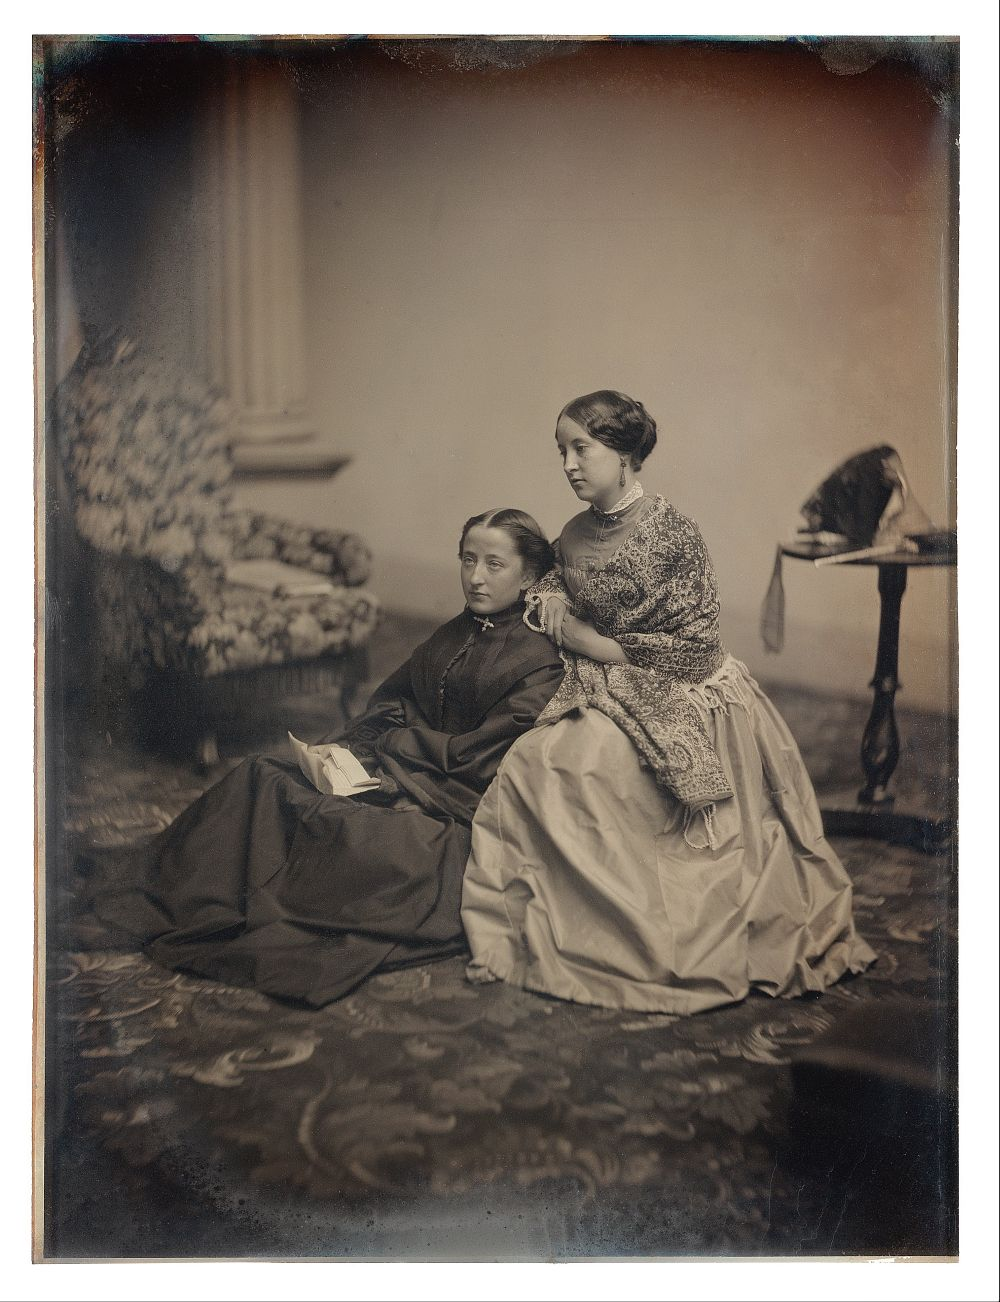 Albert Sands Southworth and Josiah Johnson Hawes - The Letter, circa 1850, Medium Daguerreotype